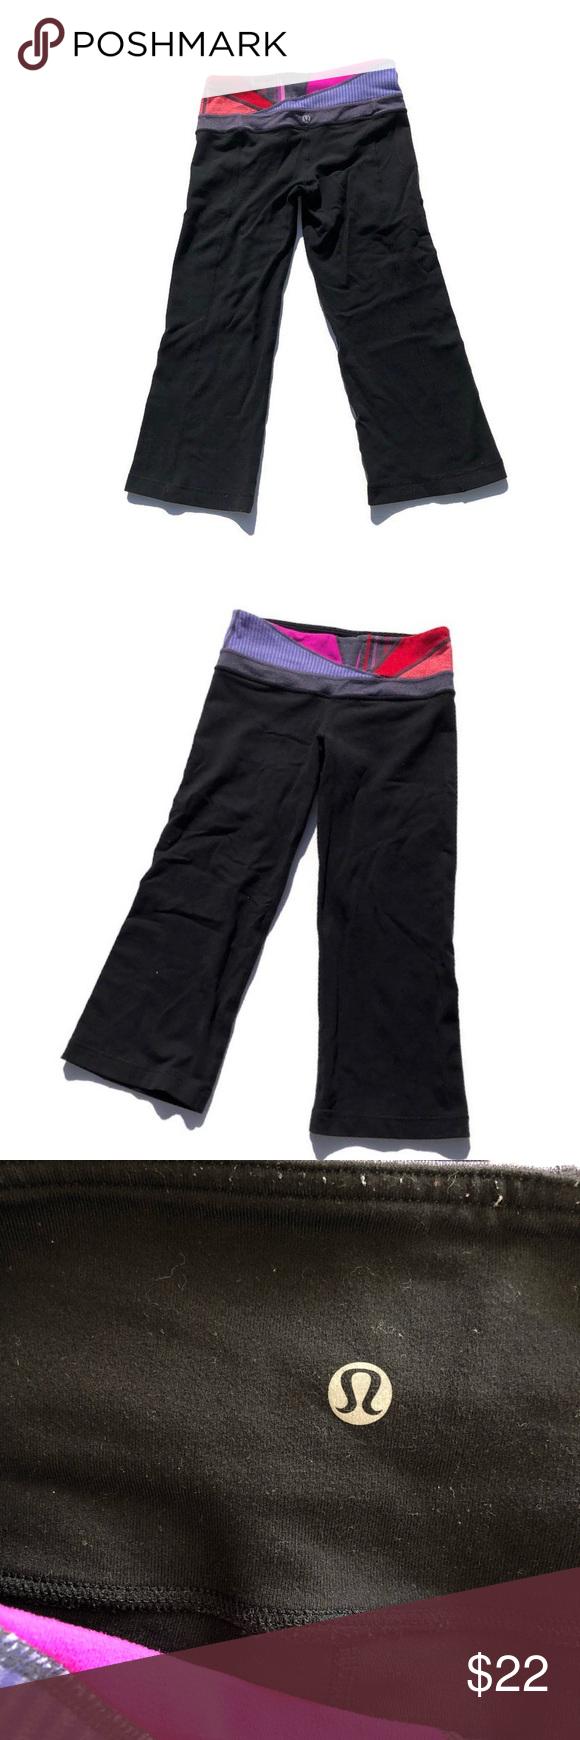 "Lululemon wide leg crop pants Good condition older Lululemon wide leg yoga capris. Multi color waistband. 19.5"" inseam. #1192 lululemon athletica Pants Capris"